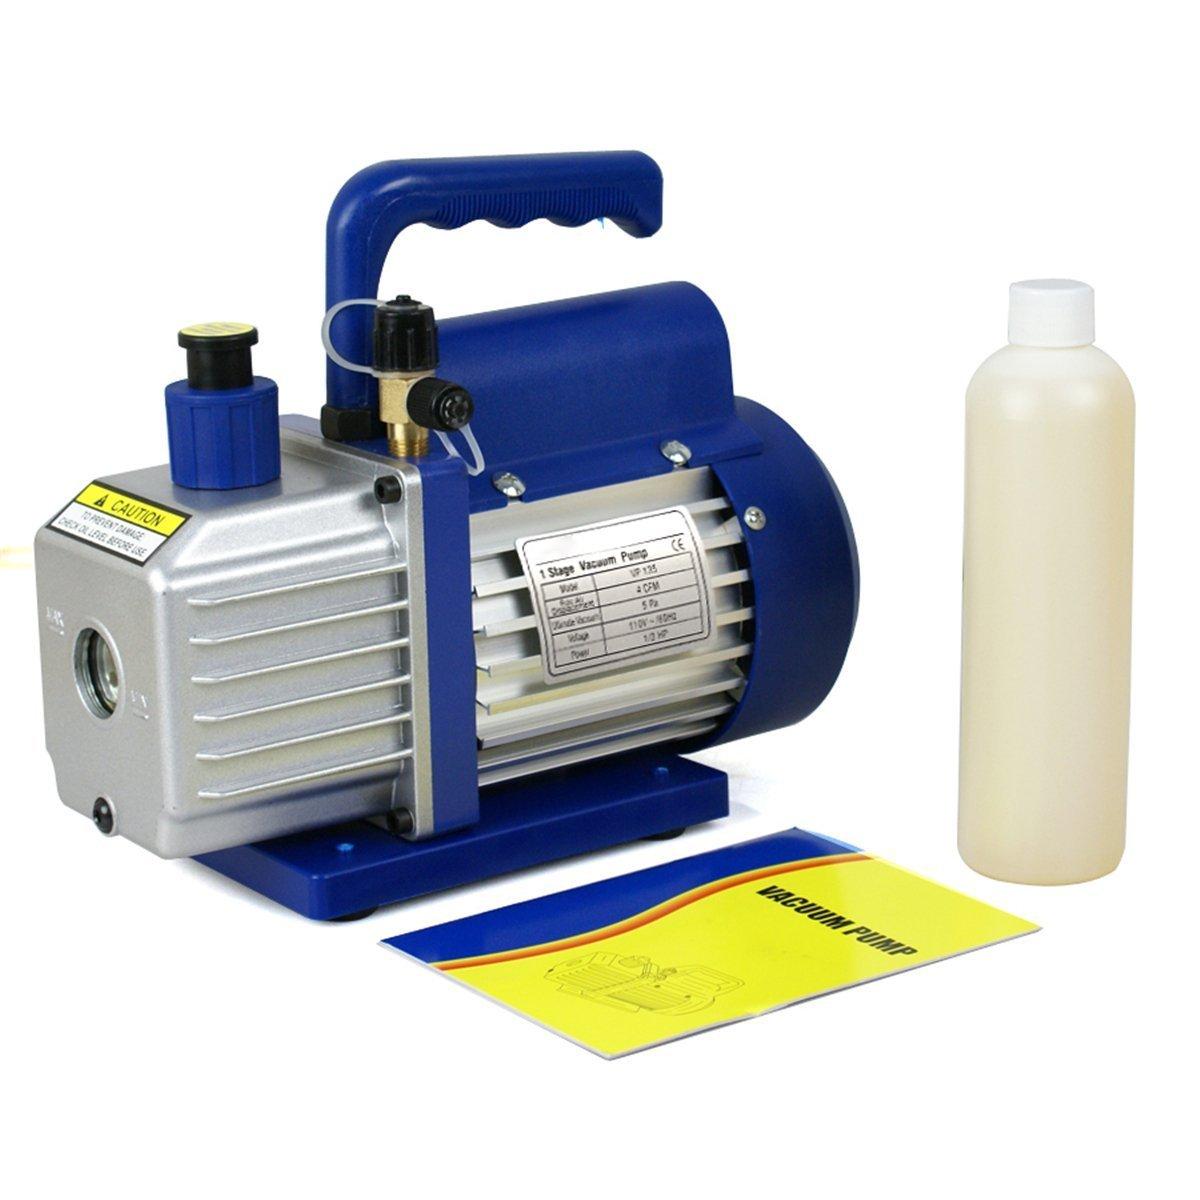 Smartxchoices 4 CFM Electric Single-Stage Rotary Vane Deep Vacuum Pump & 1/4HP HVAC A/C Refrigeration Kit AC Manifold Gauge Combo Set R410a/R134a (4 CFM Vacuum Pump)